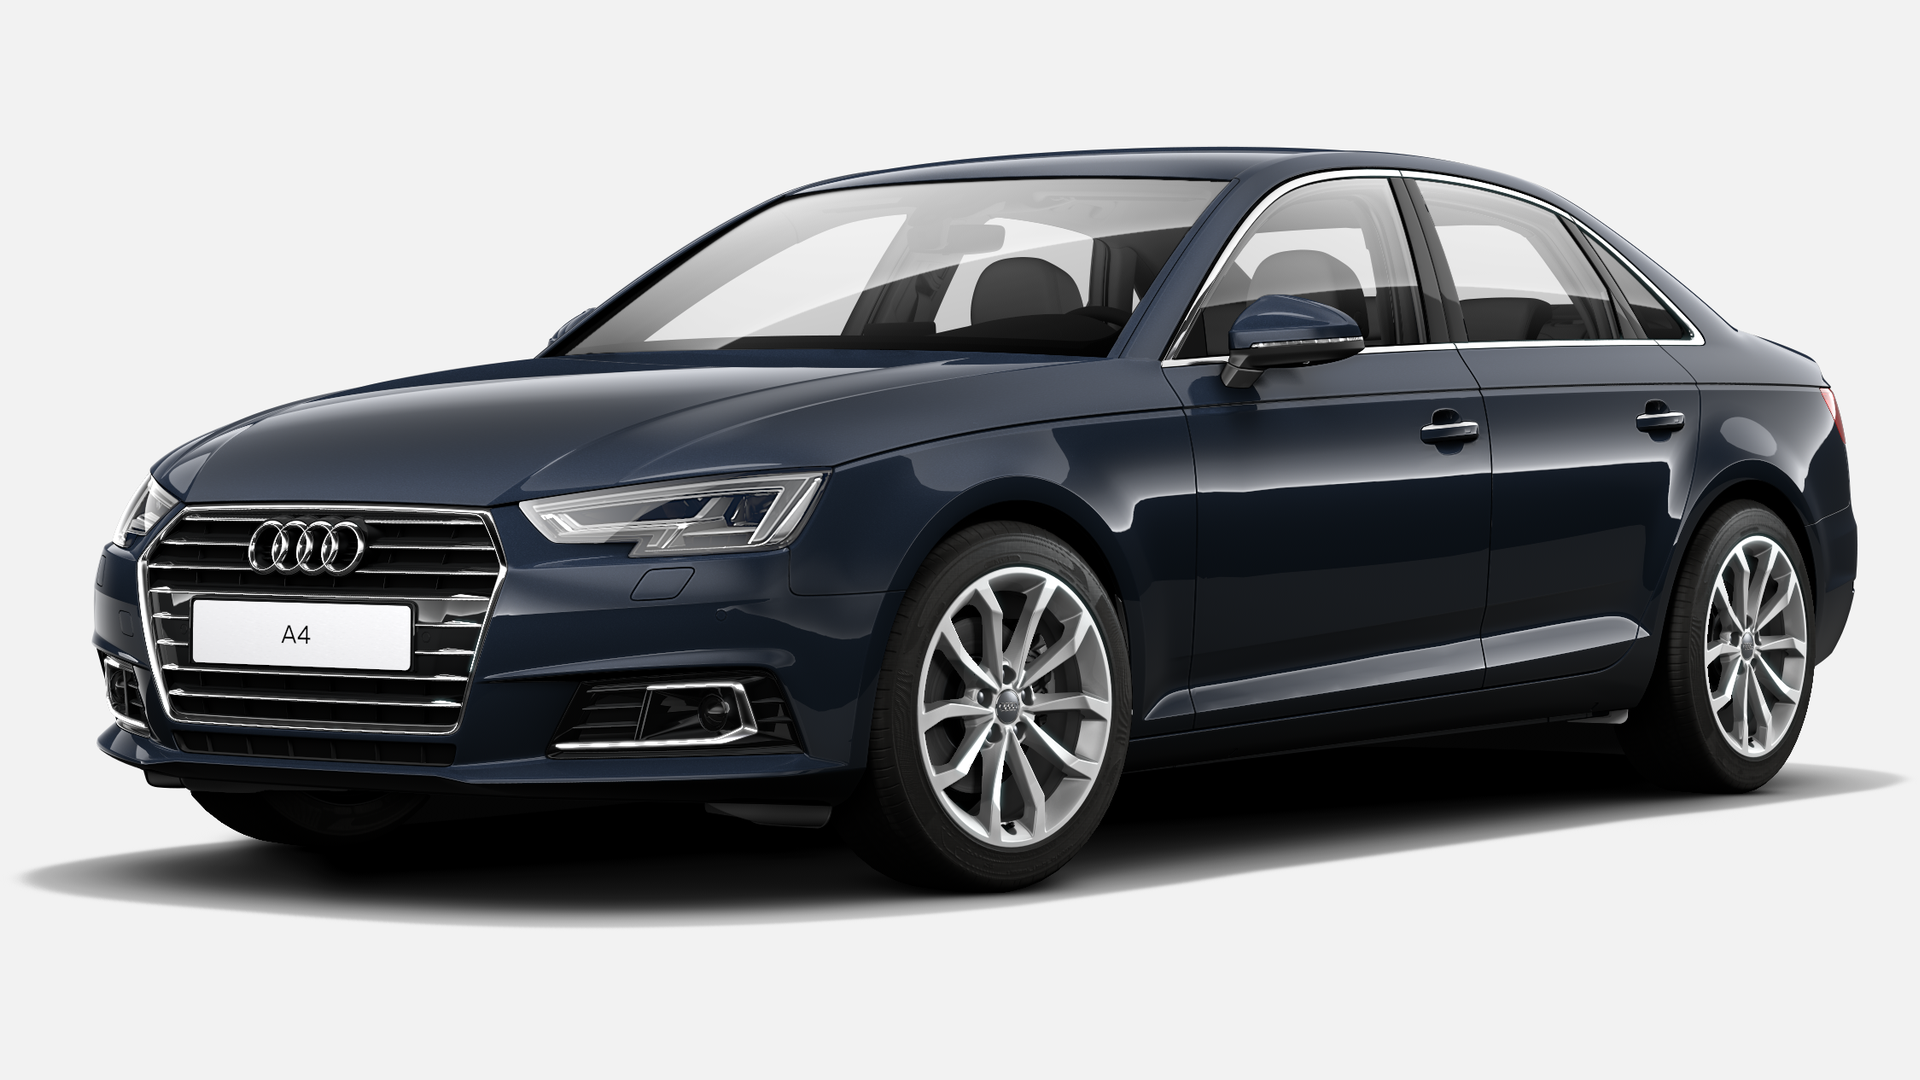 Foto 1 Audi A4 2.0 TDI Design Edition 110 kW (150 CV)